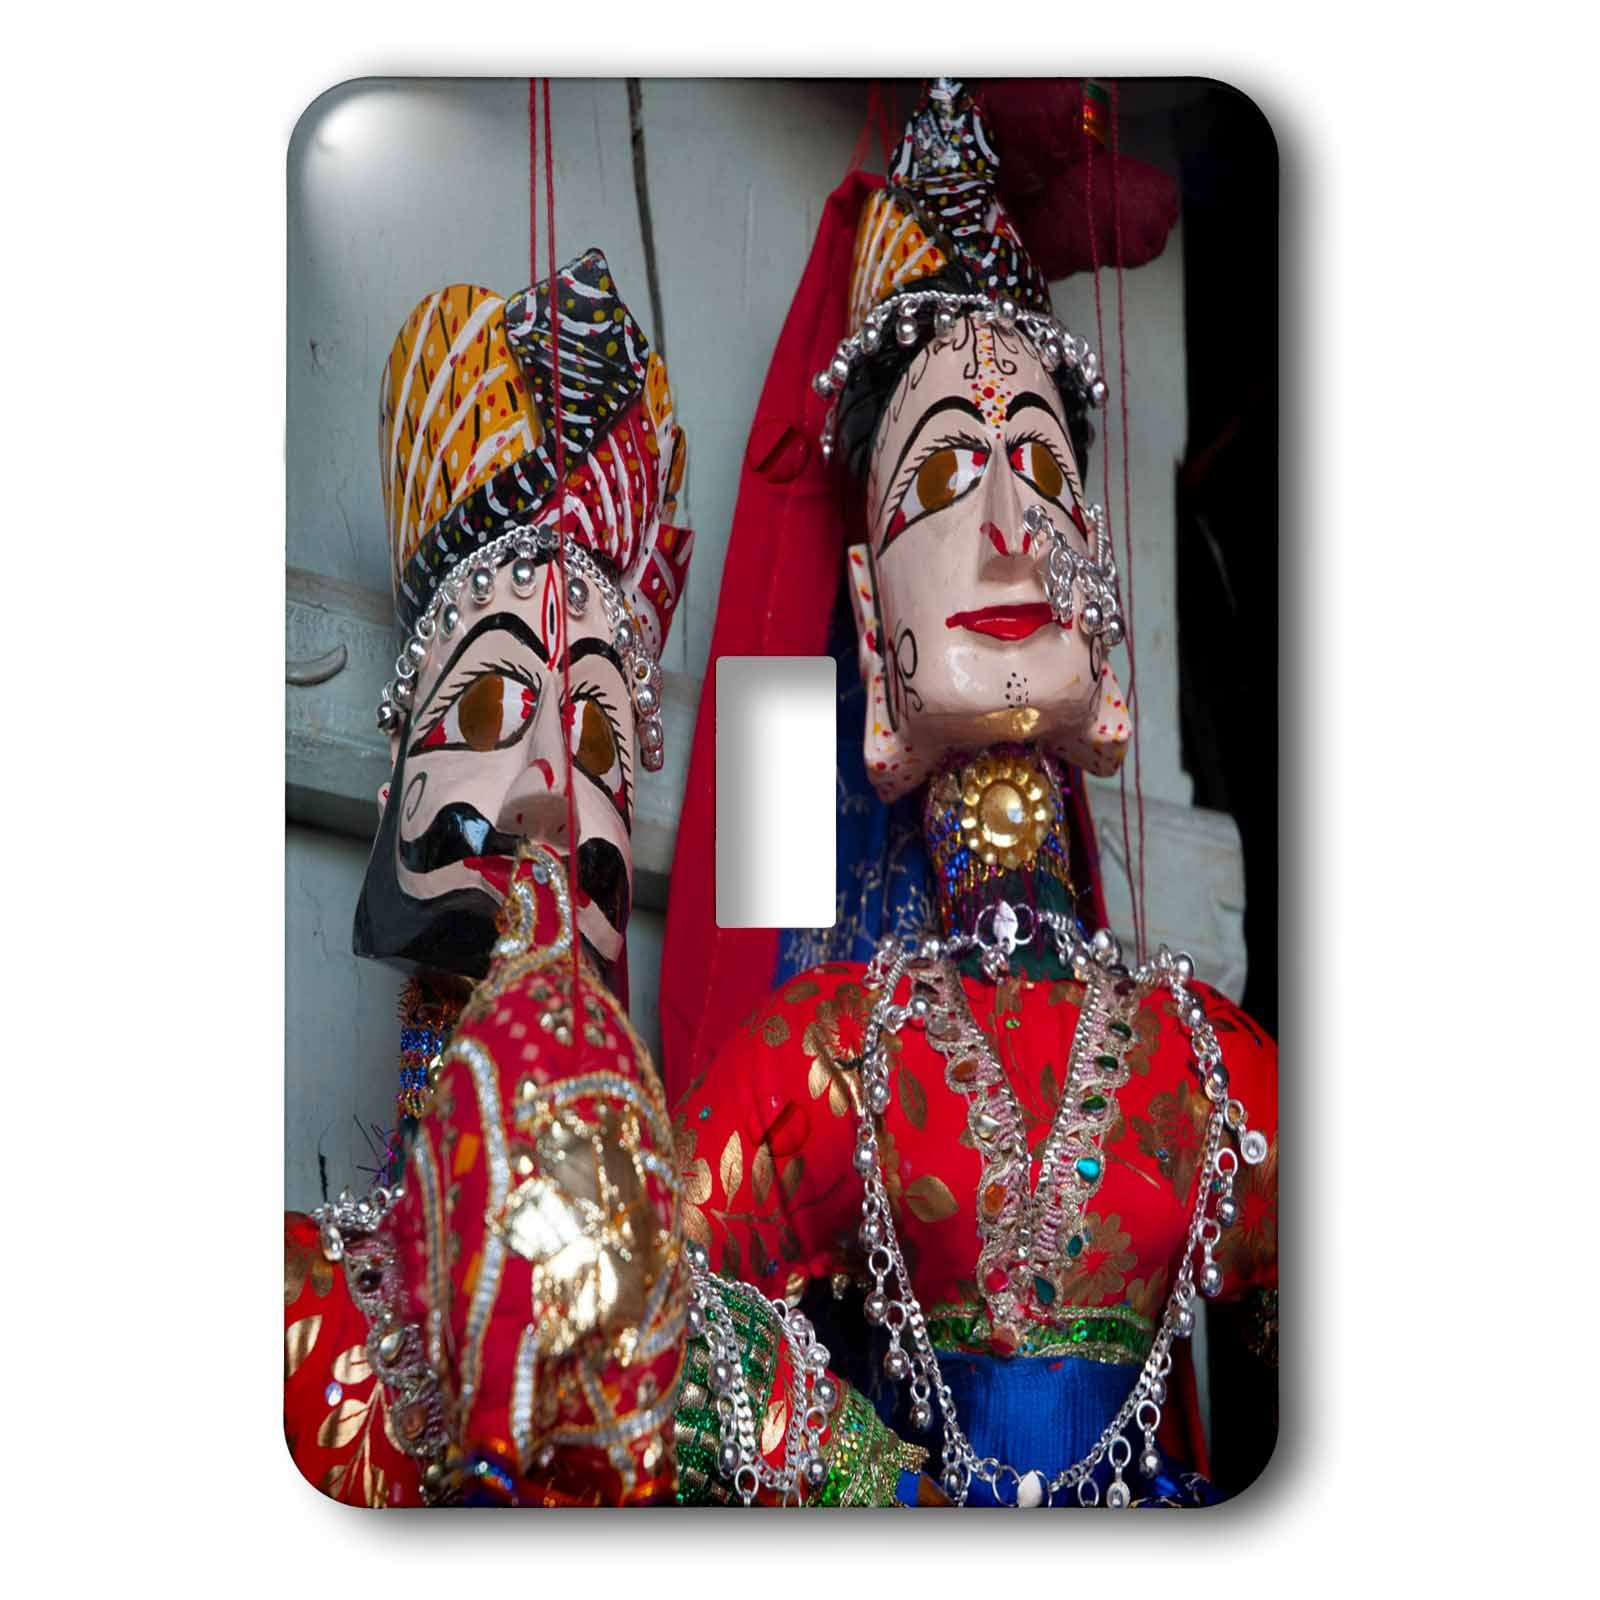 3dRose lsp_188194_1 Kathputli, Traditional Rajasthani Puppets, Pushkar, Rajasthan, India. - Single Toggle Switch